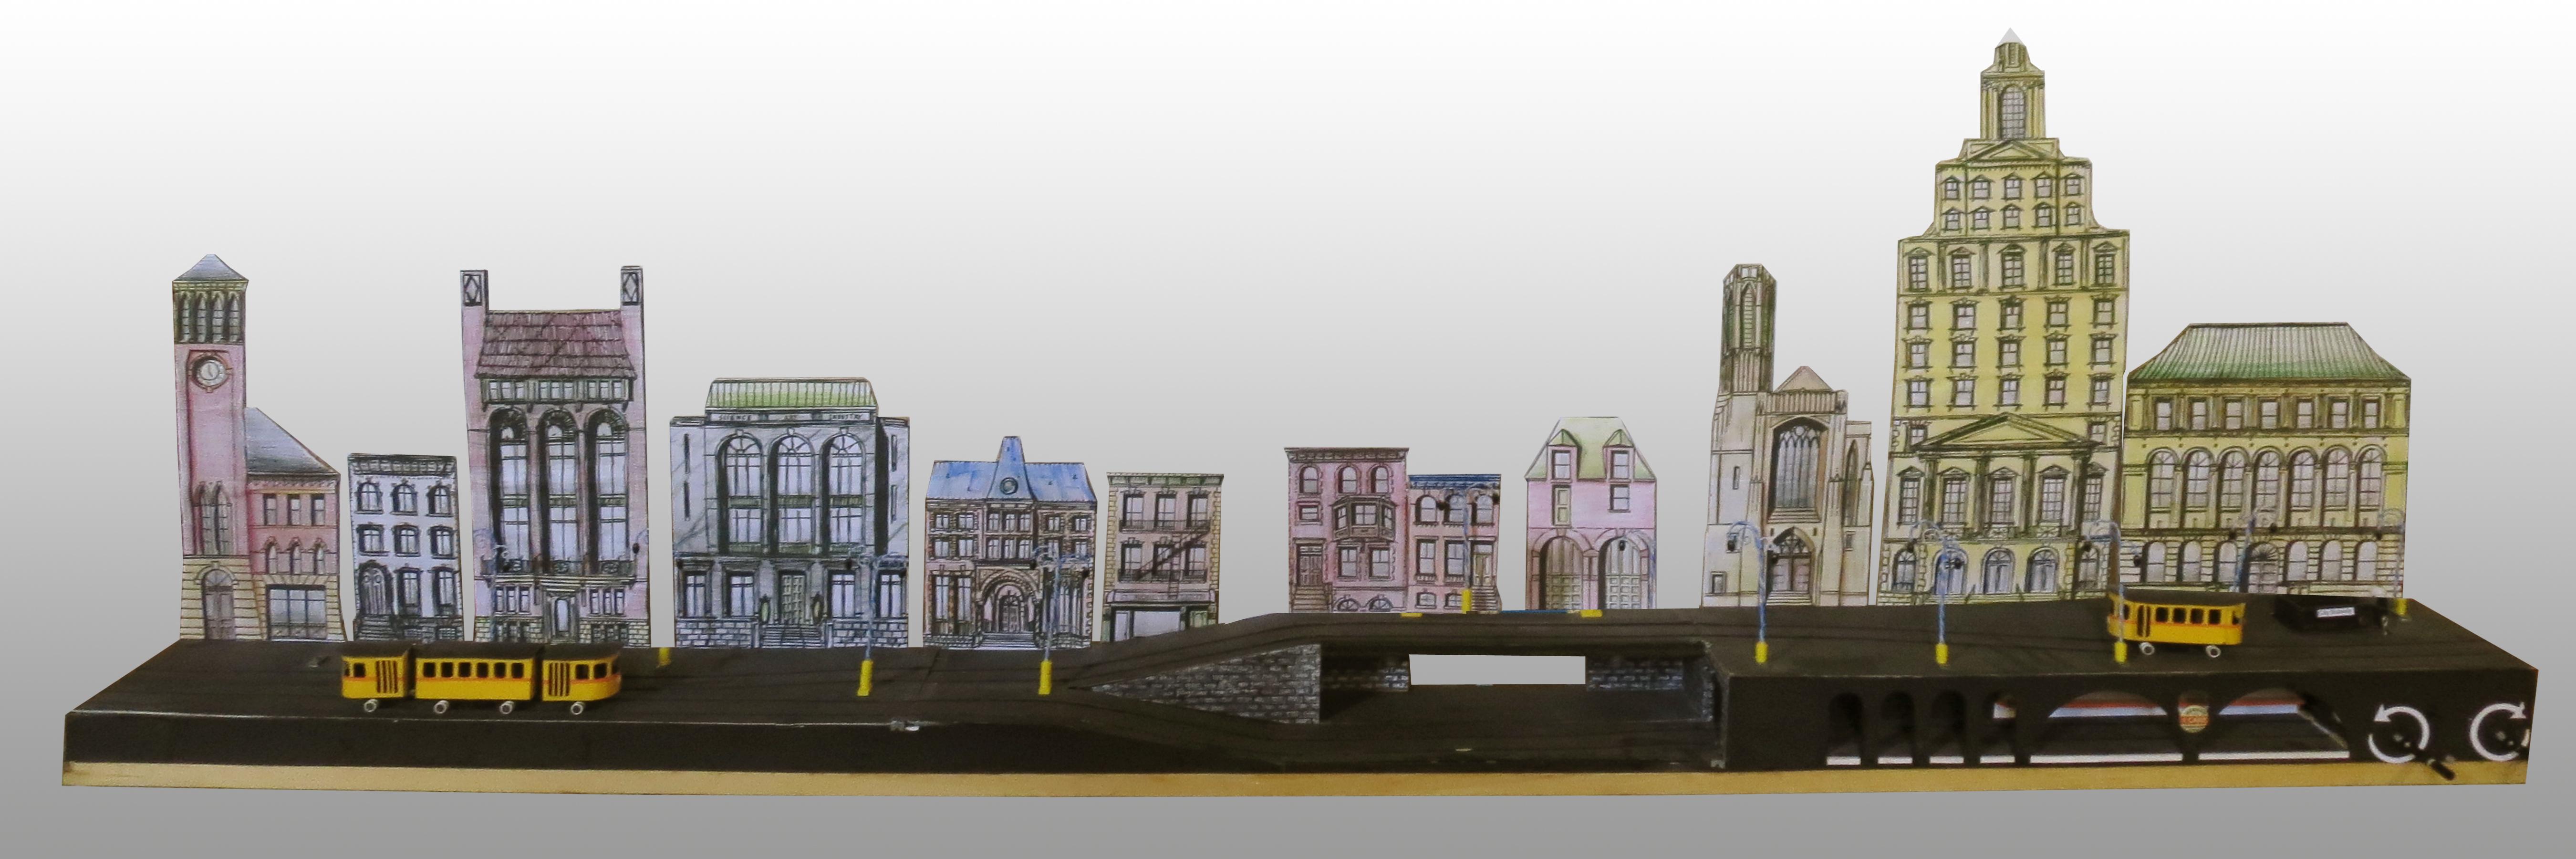 Newark Model Small